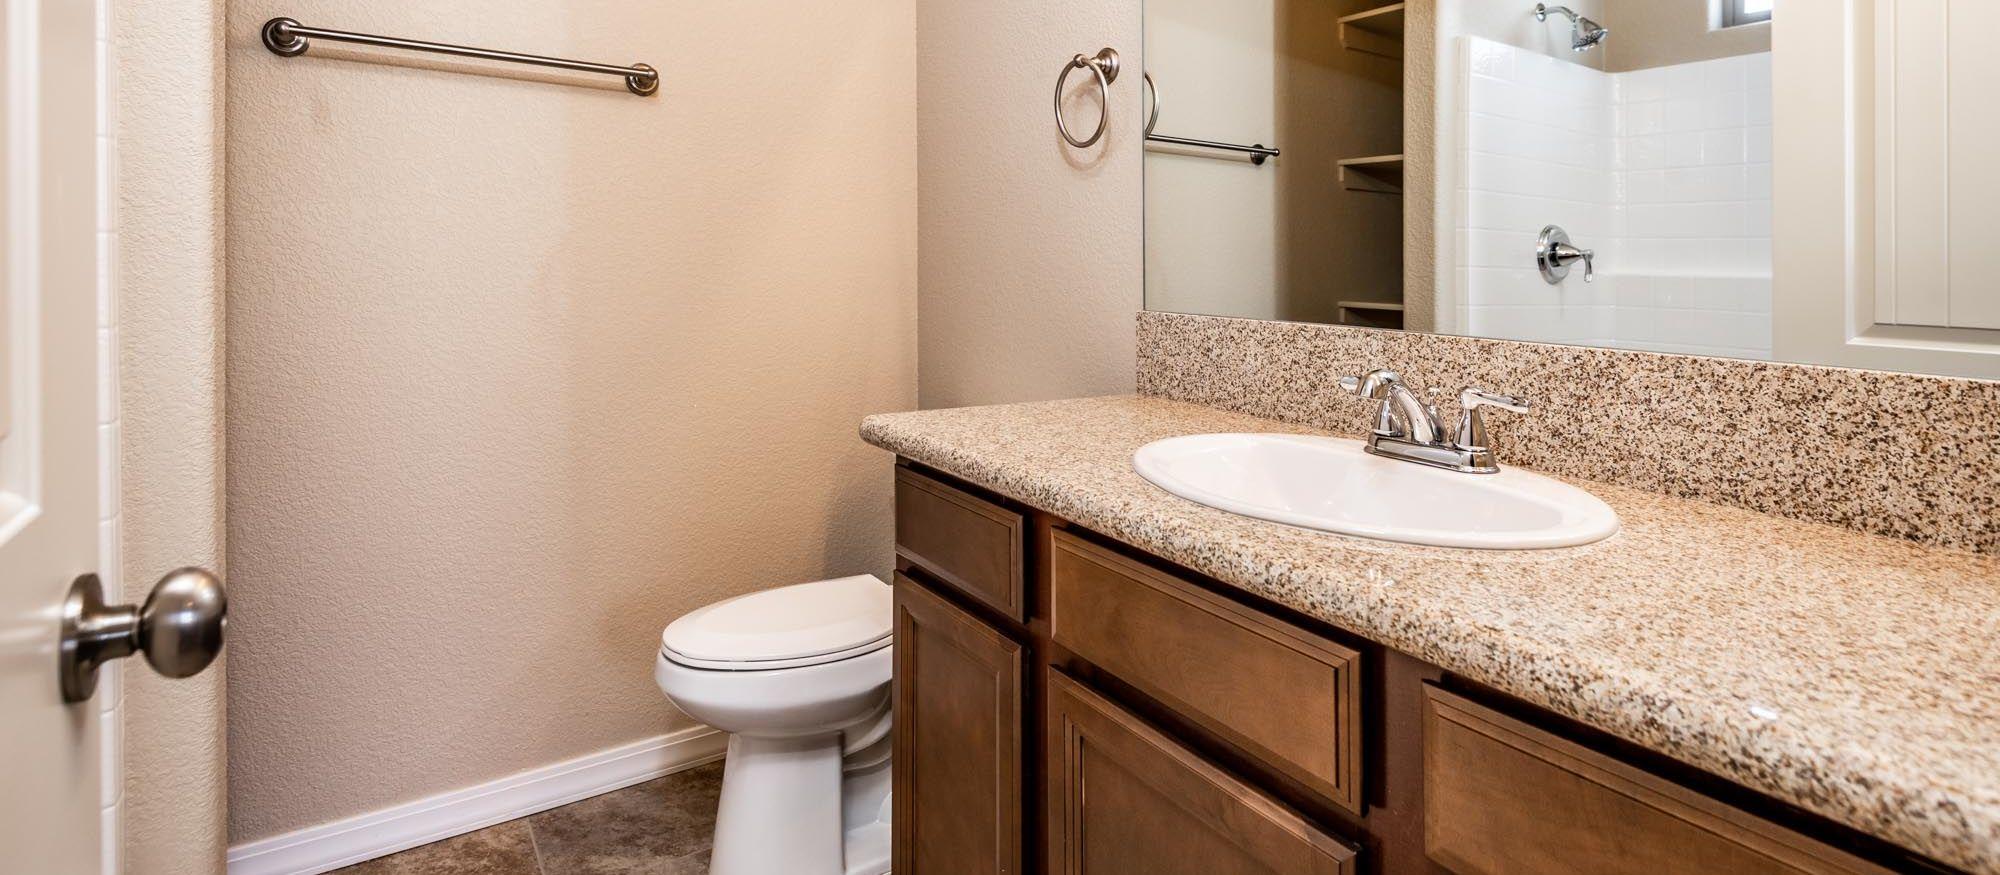 Bathroom featured in the Juniper Junior 1397 By Angle Homes in Kingman-Lake Havasu City, AZ